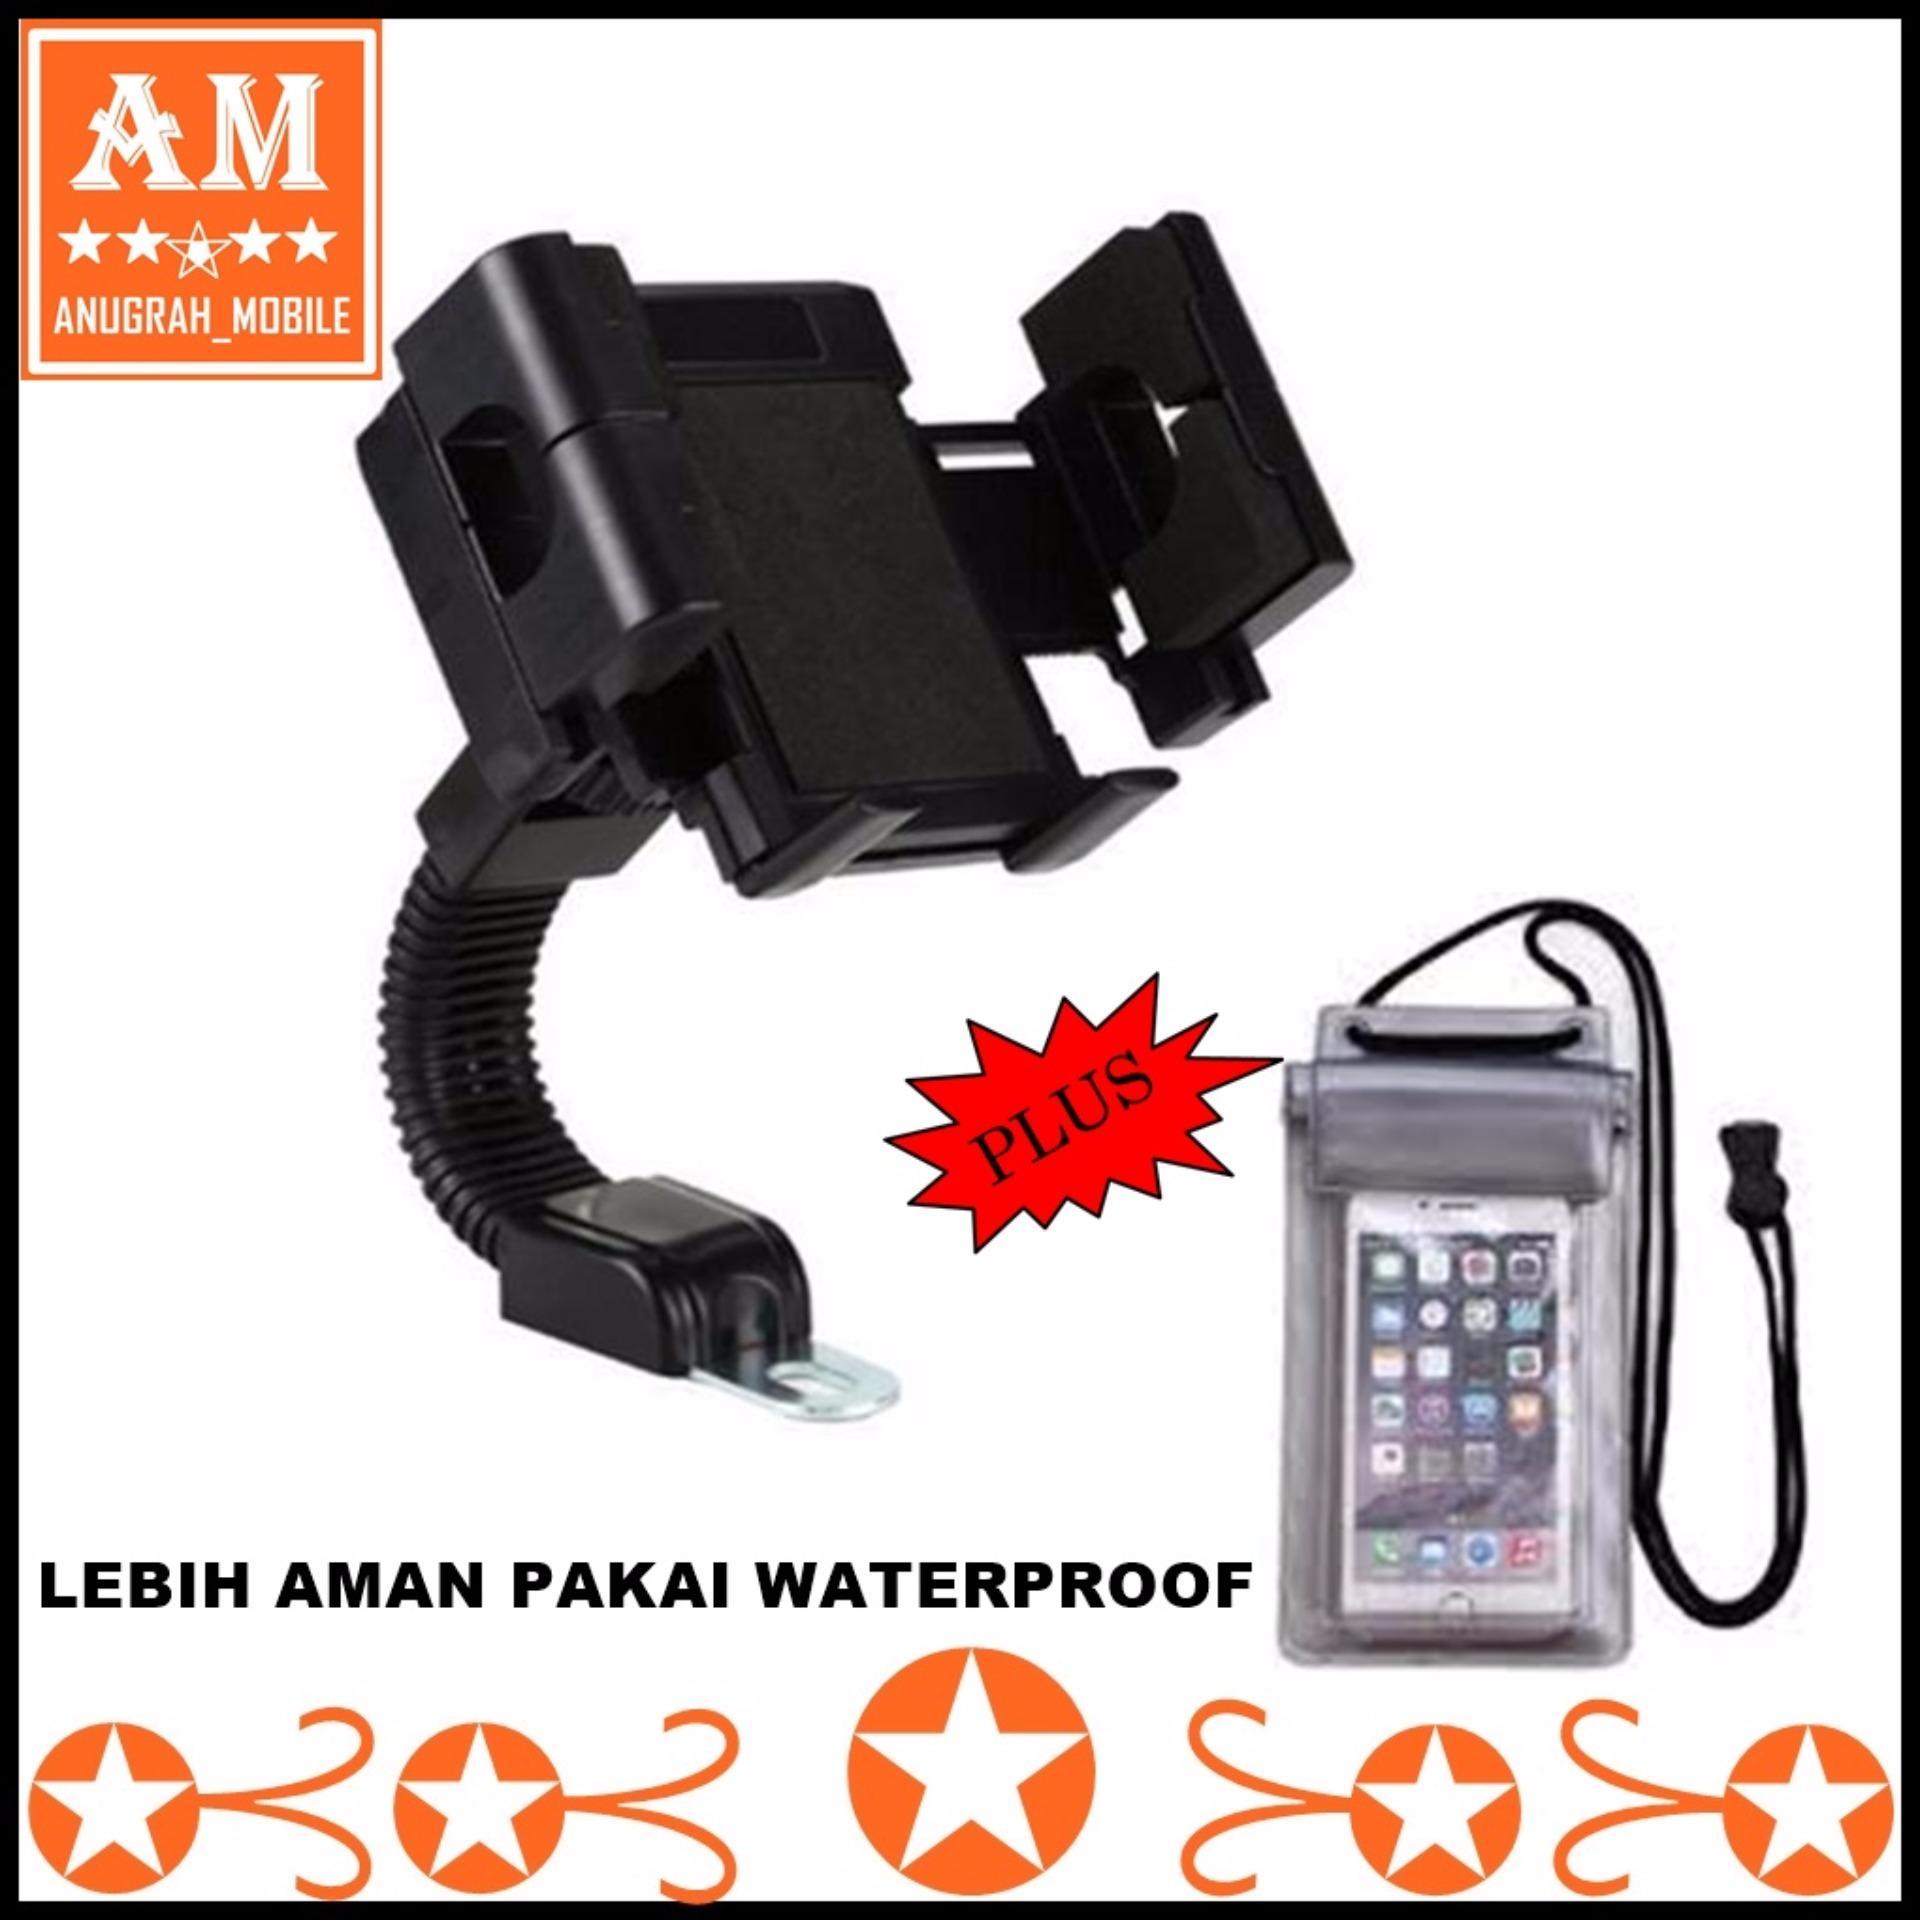 ... Universal Phone Holder Sepeda Motor Spion dudukan smatphone pada motor + Waterproof ...